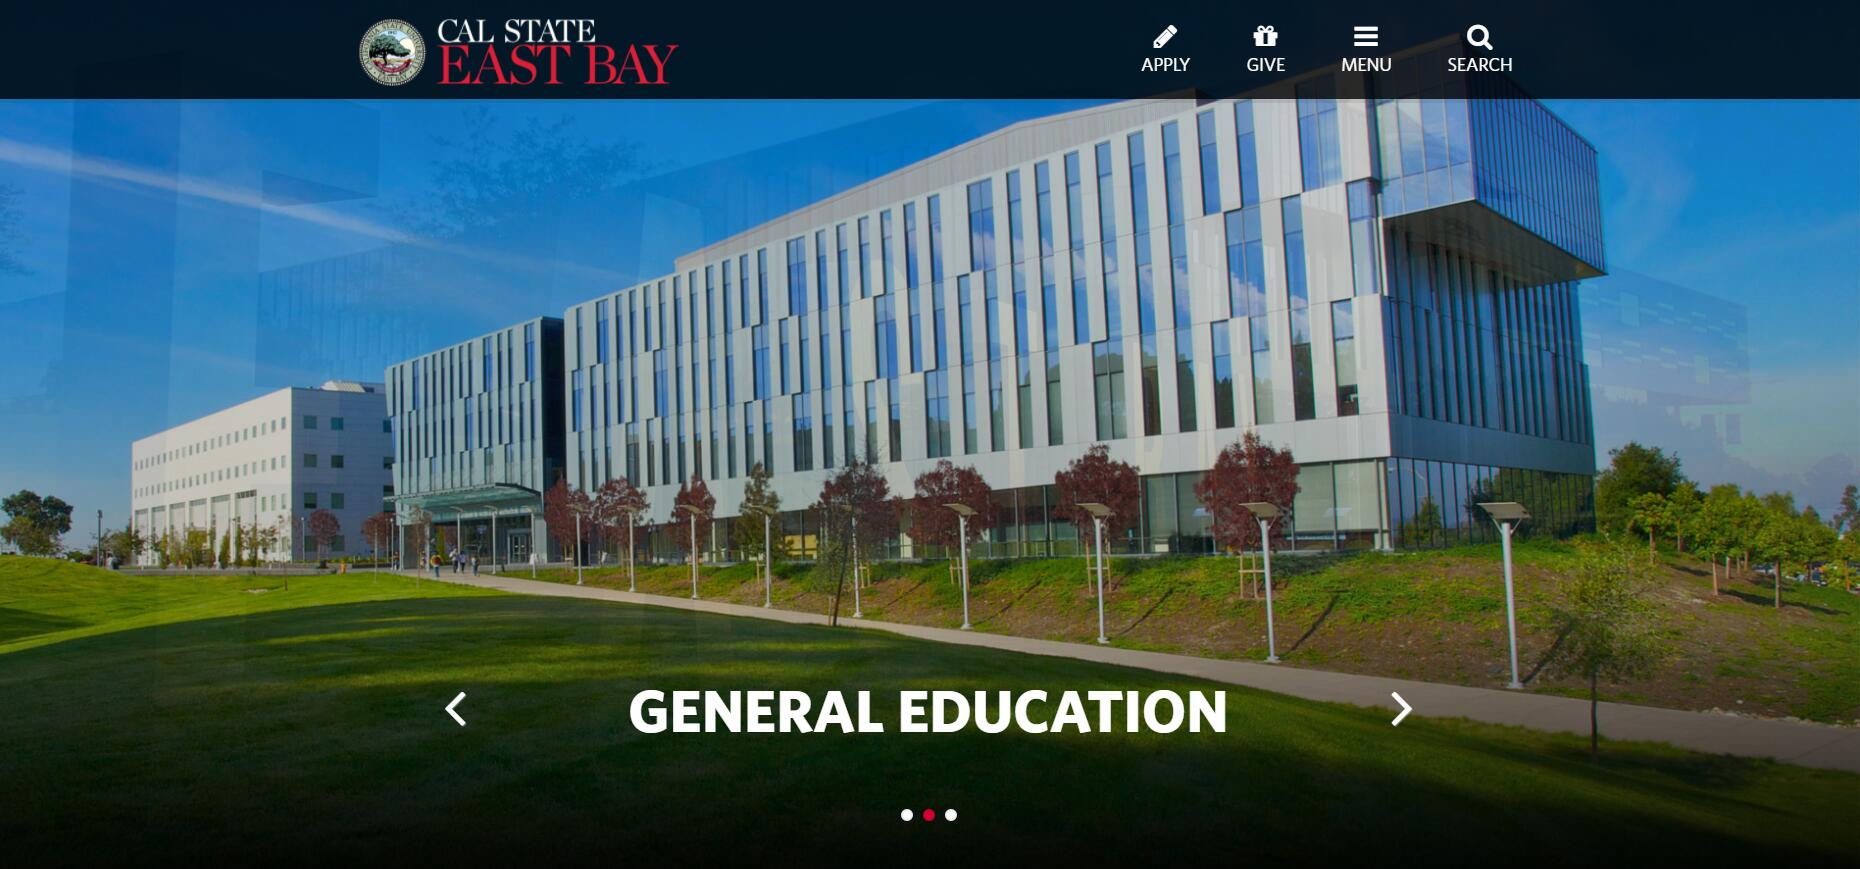 General Education - California State University, East Bay